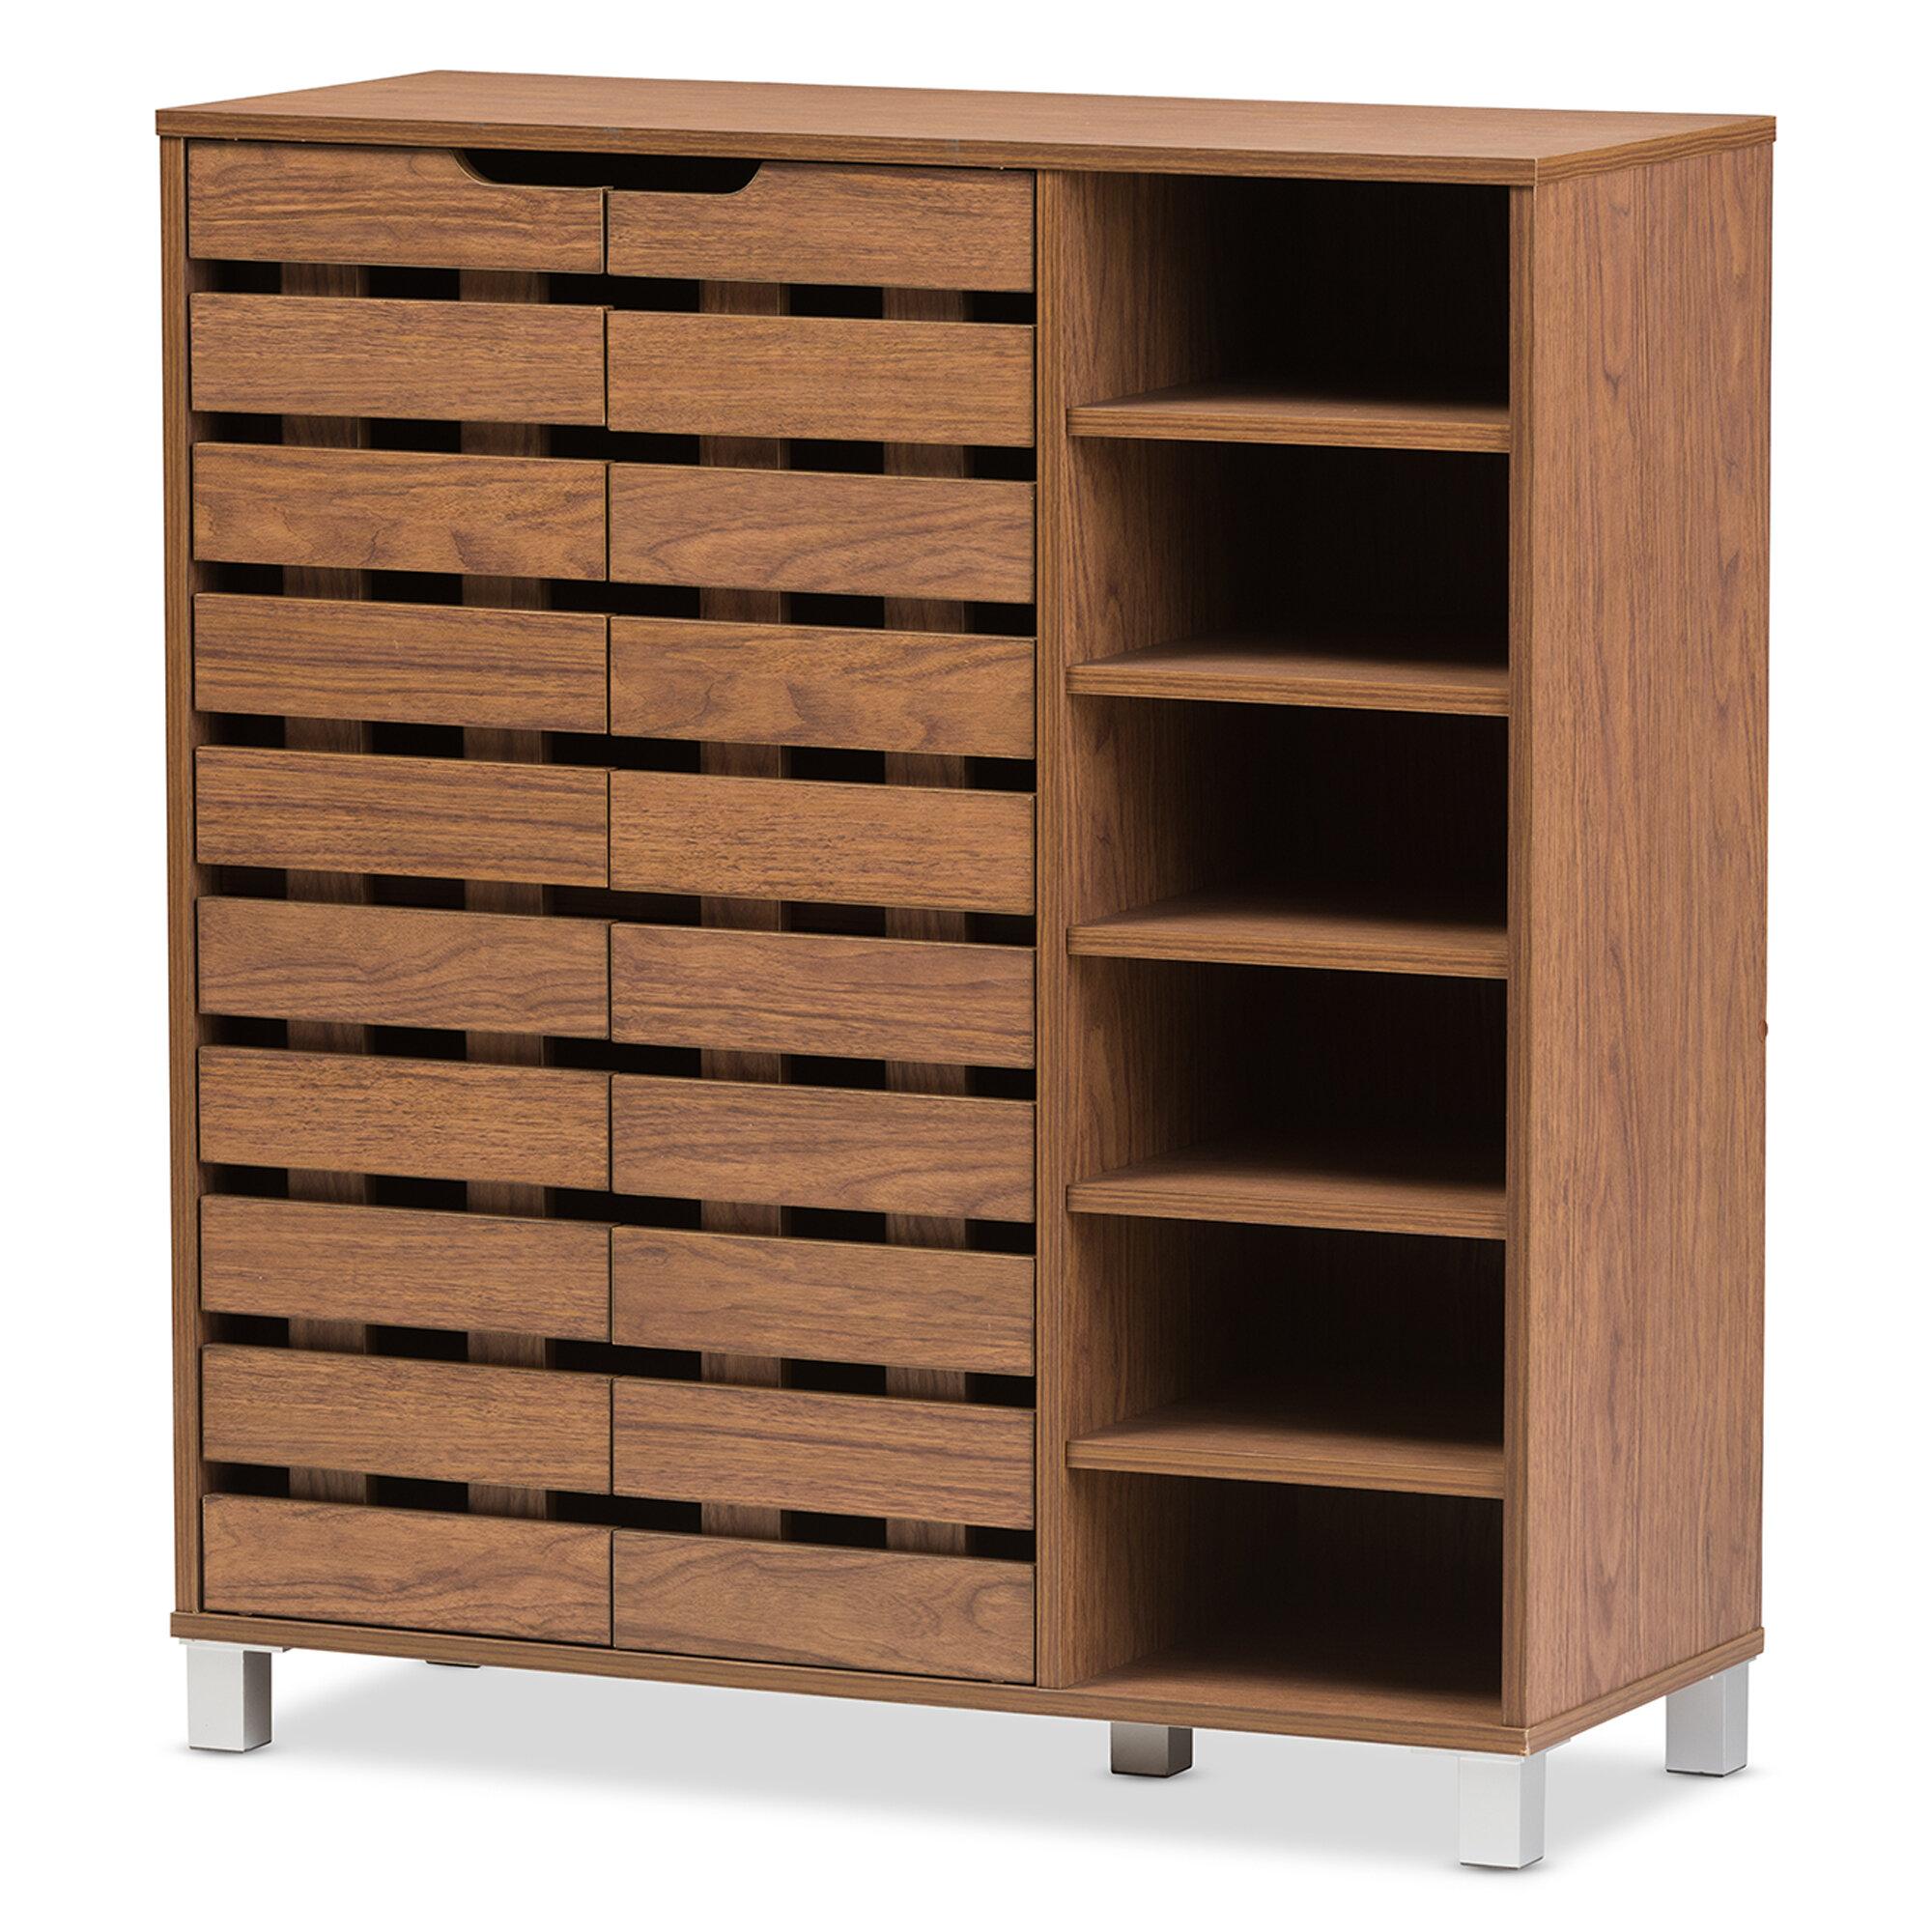 18 Pair Shoe Storage Cabinet Reviews Allmodern